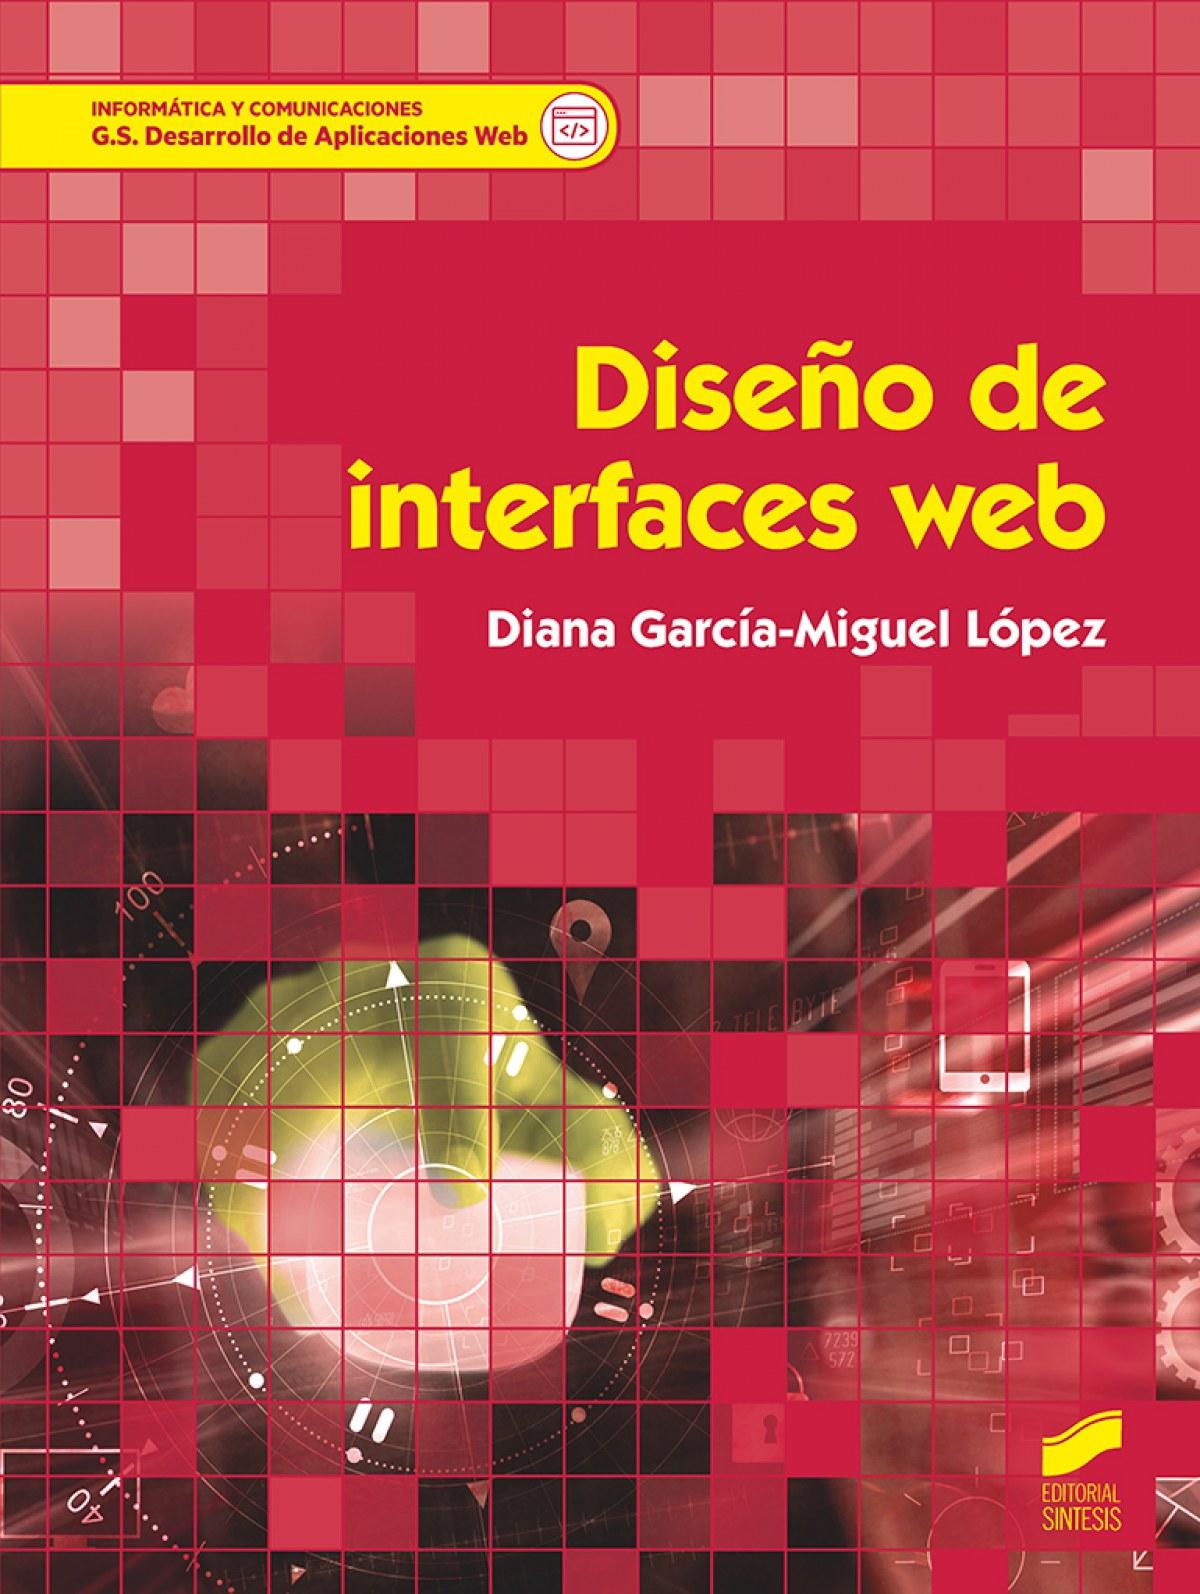 DISEÑO DE INTERFACES WEB 2019